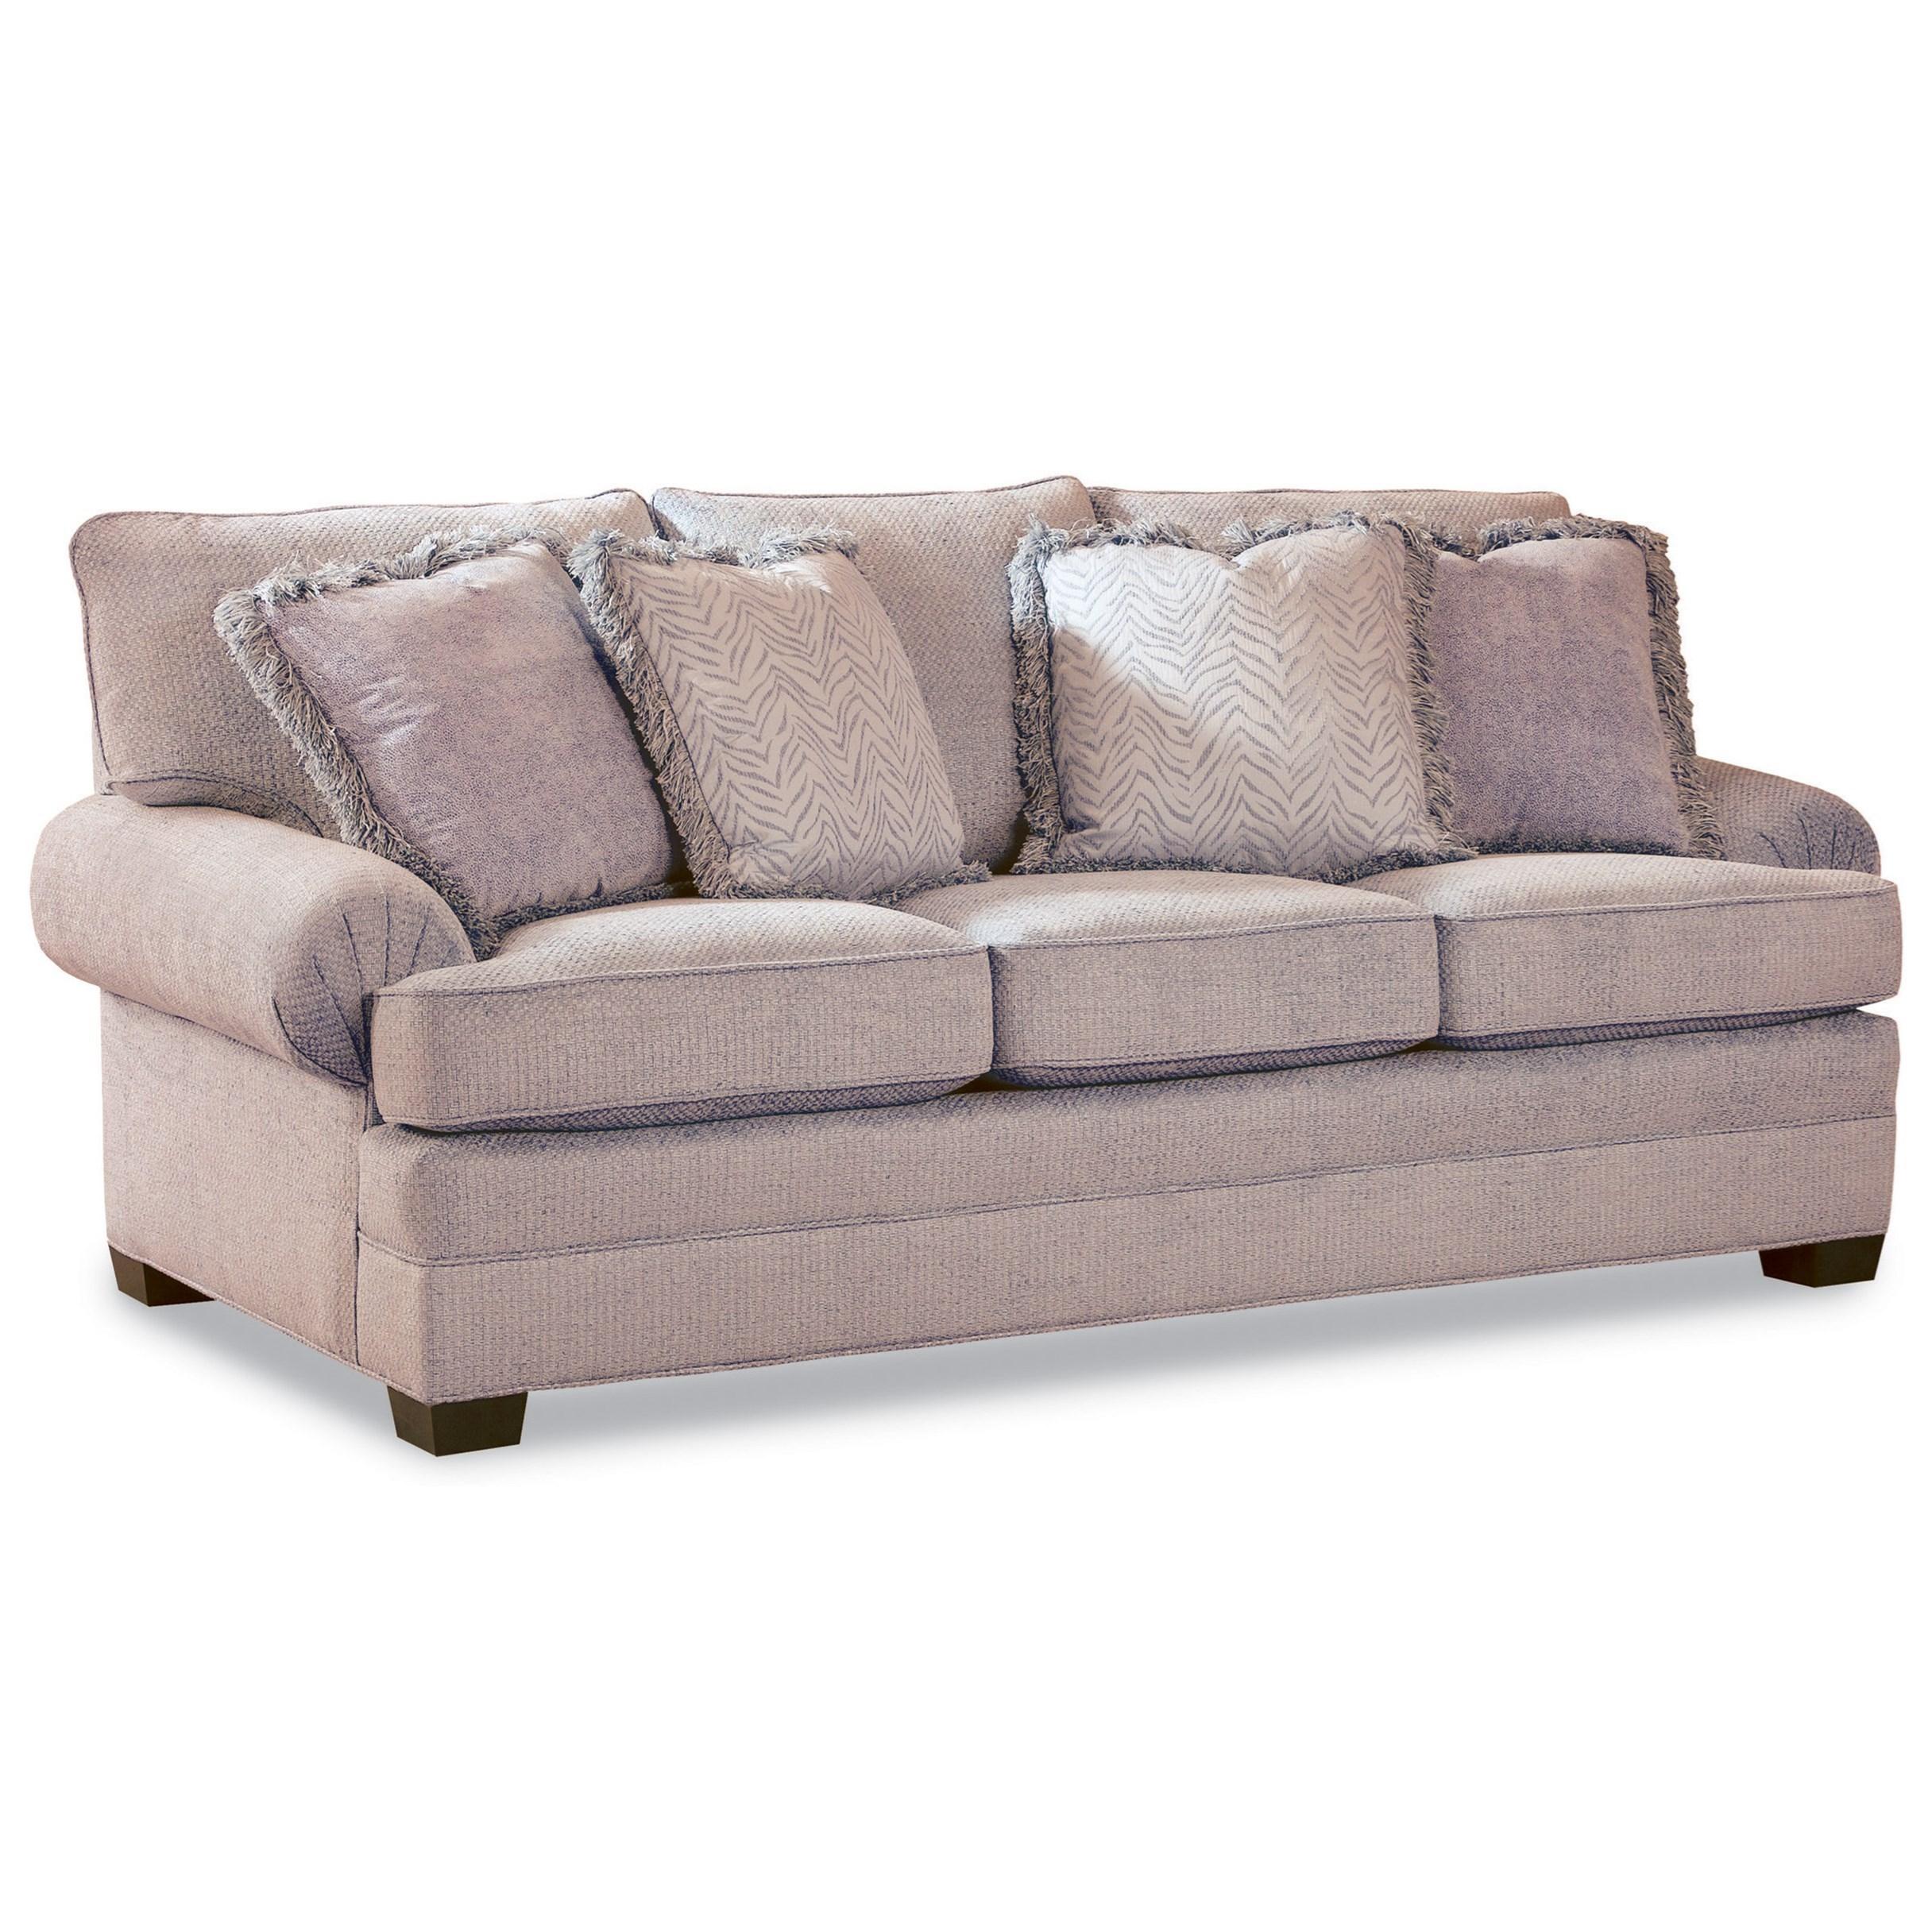 2061 Sofa by Huntington House at Belfort Furniture